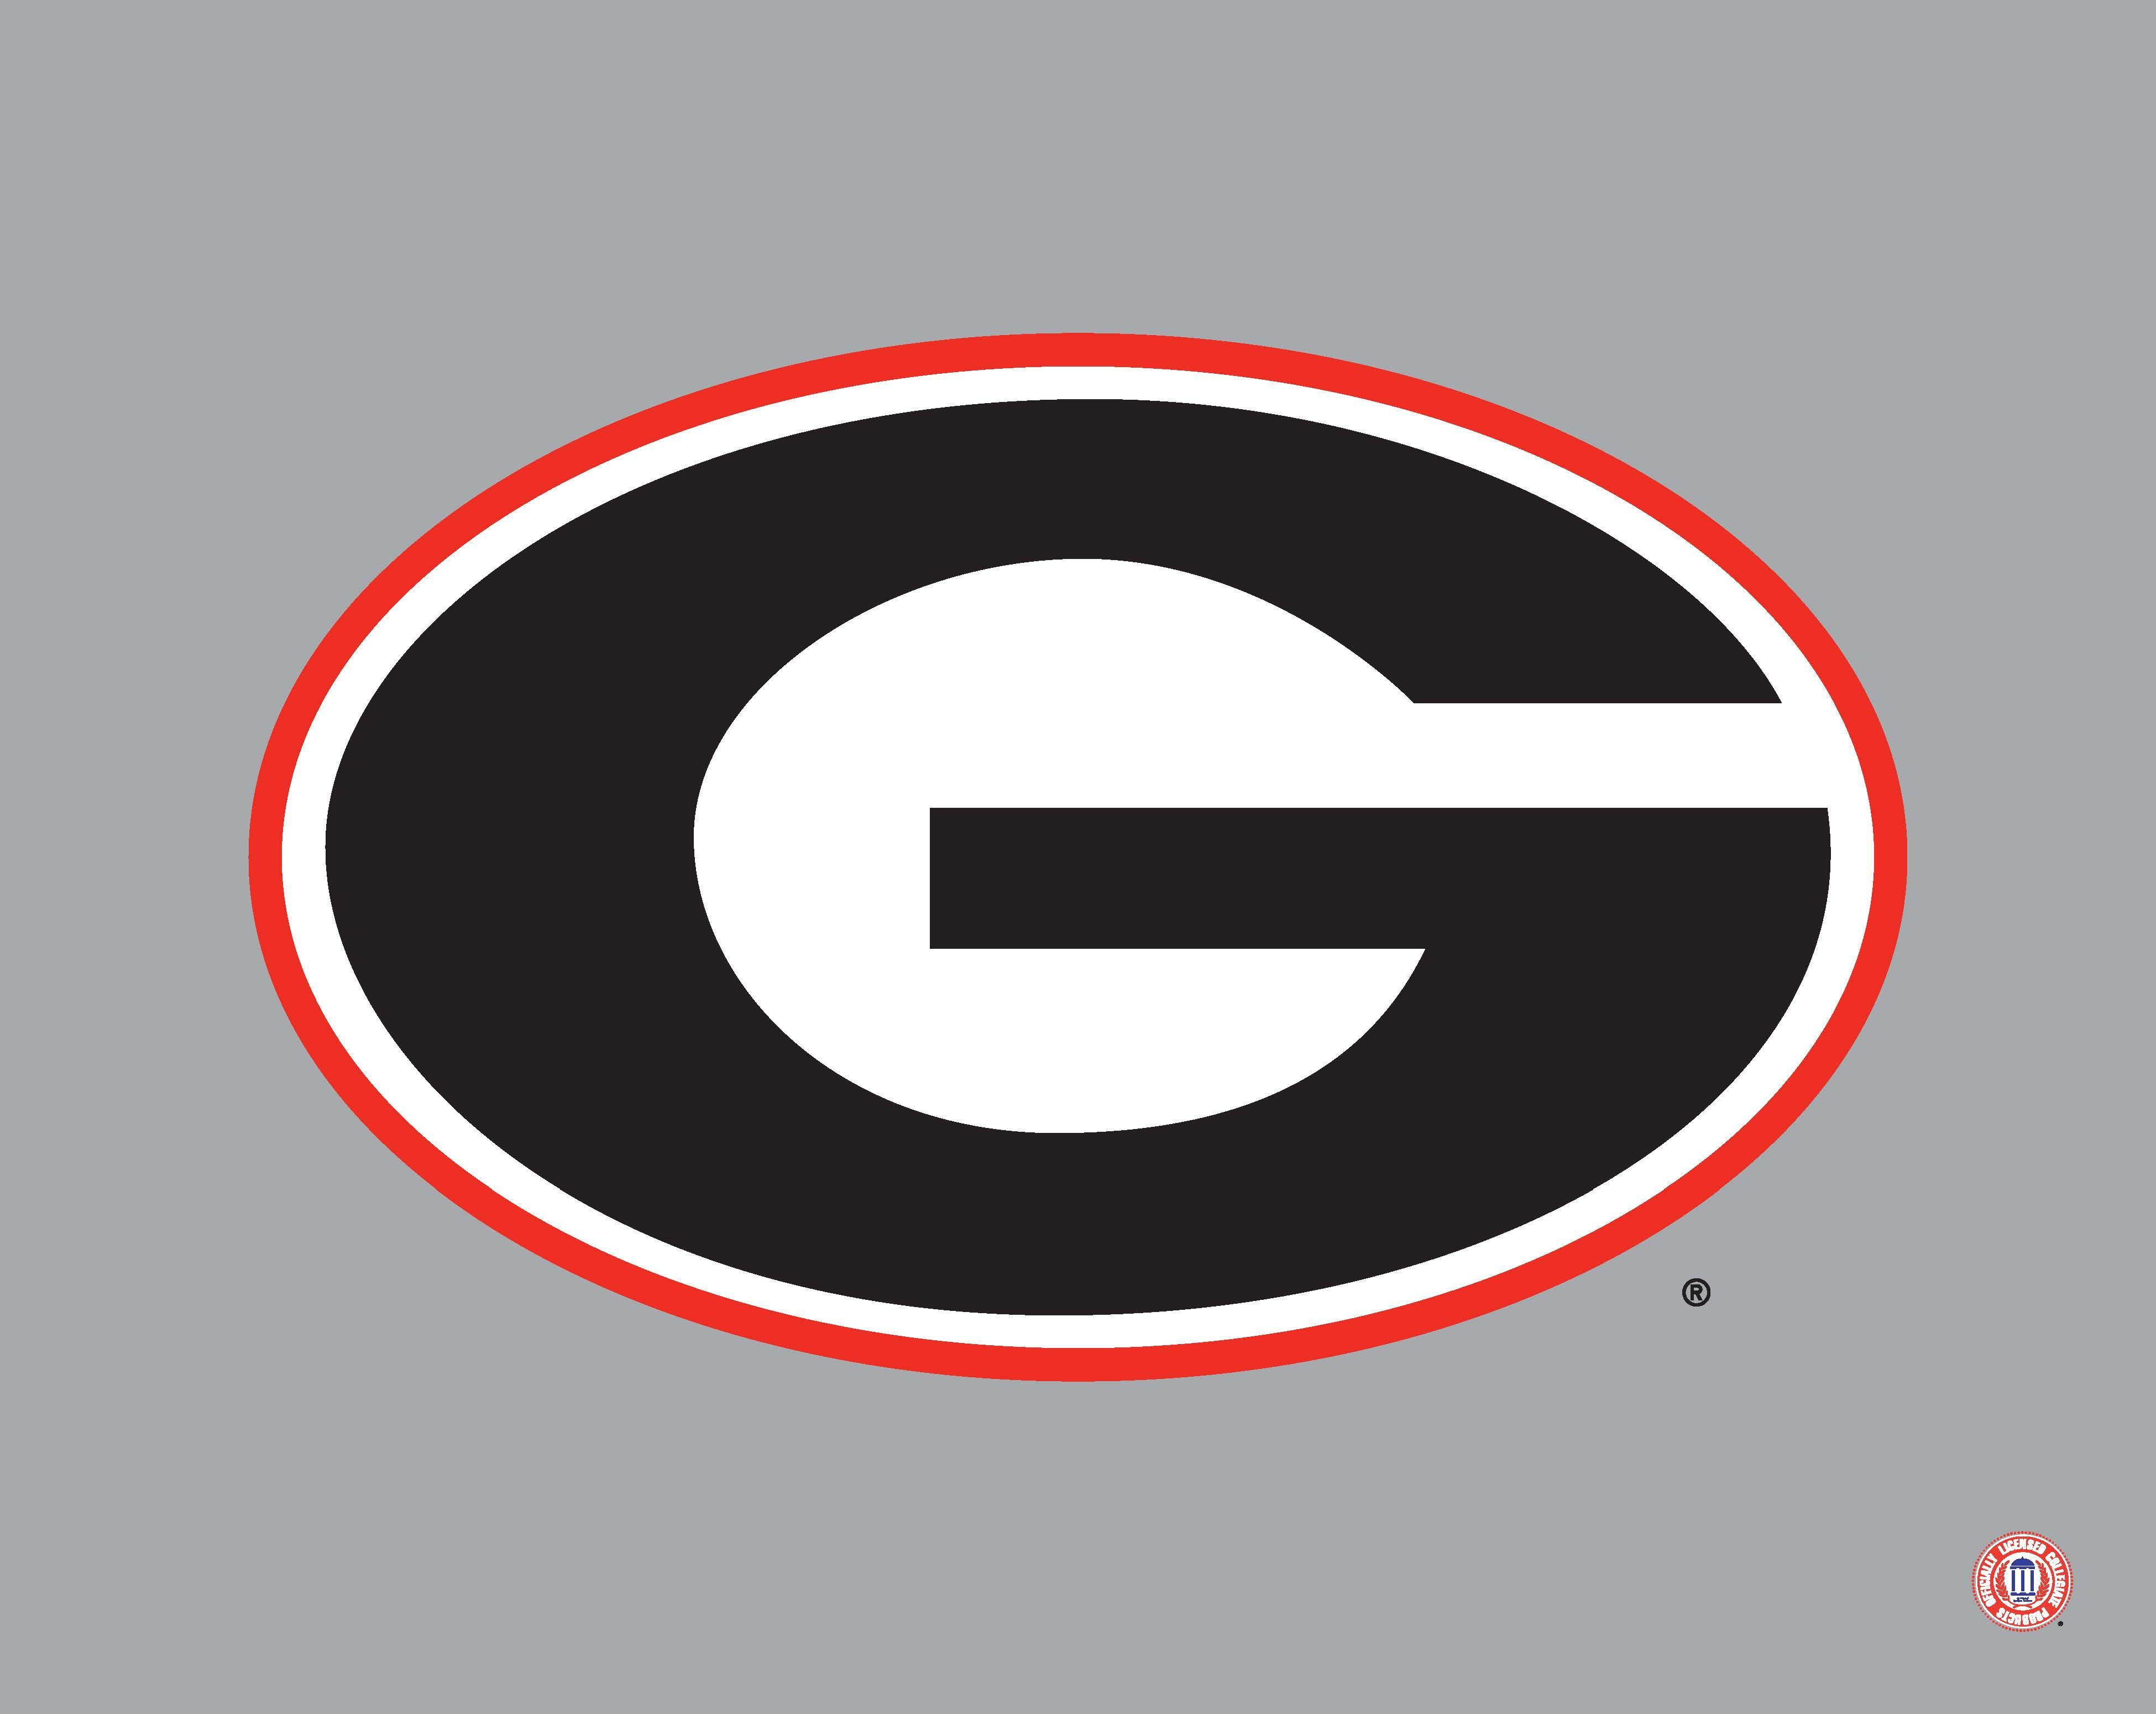 medium resolution of georgia bulldogs logo